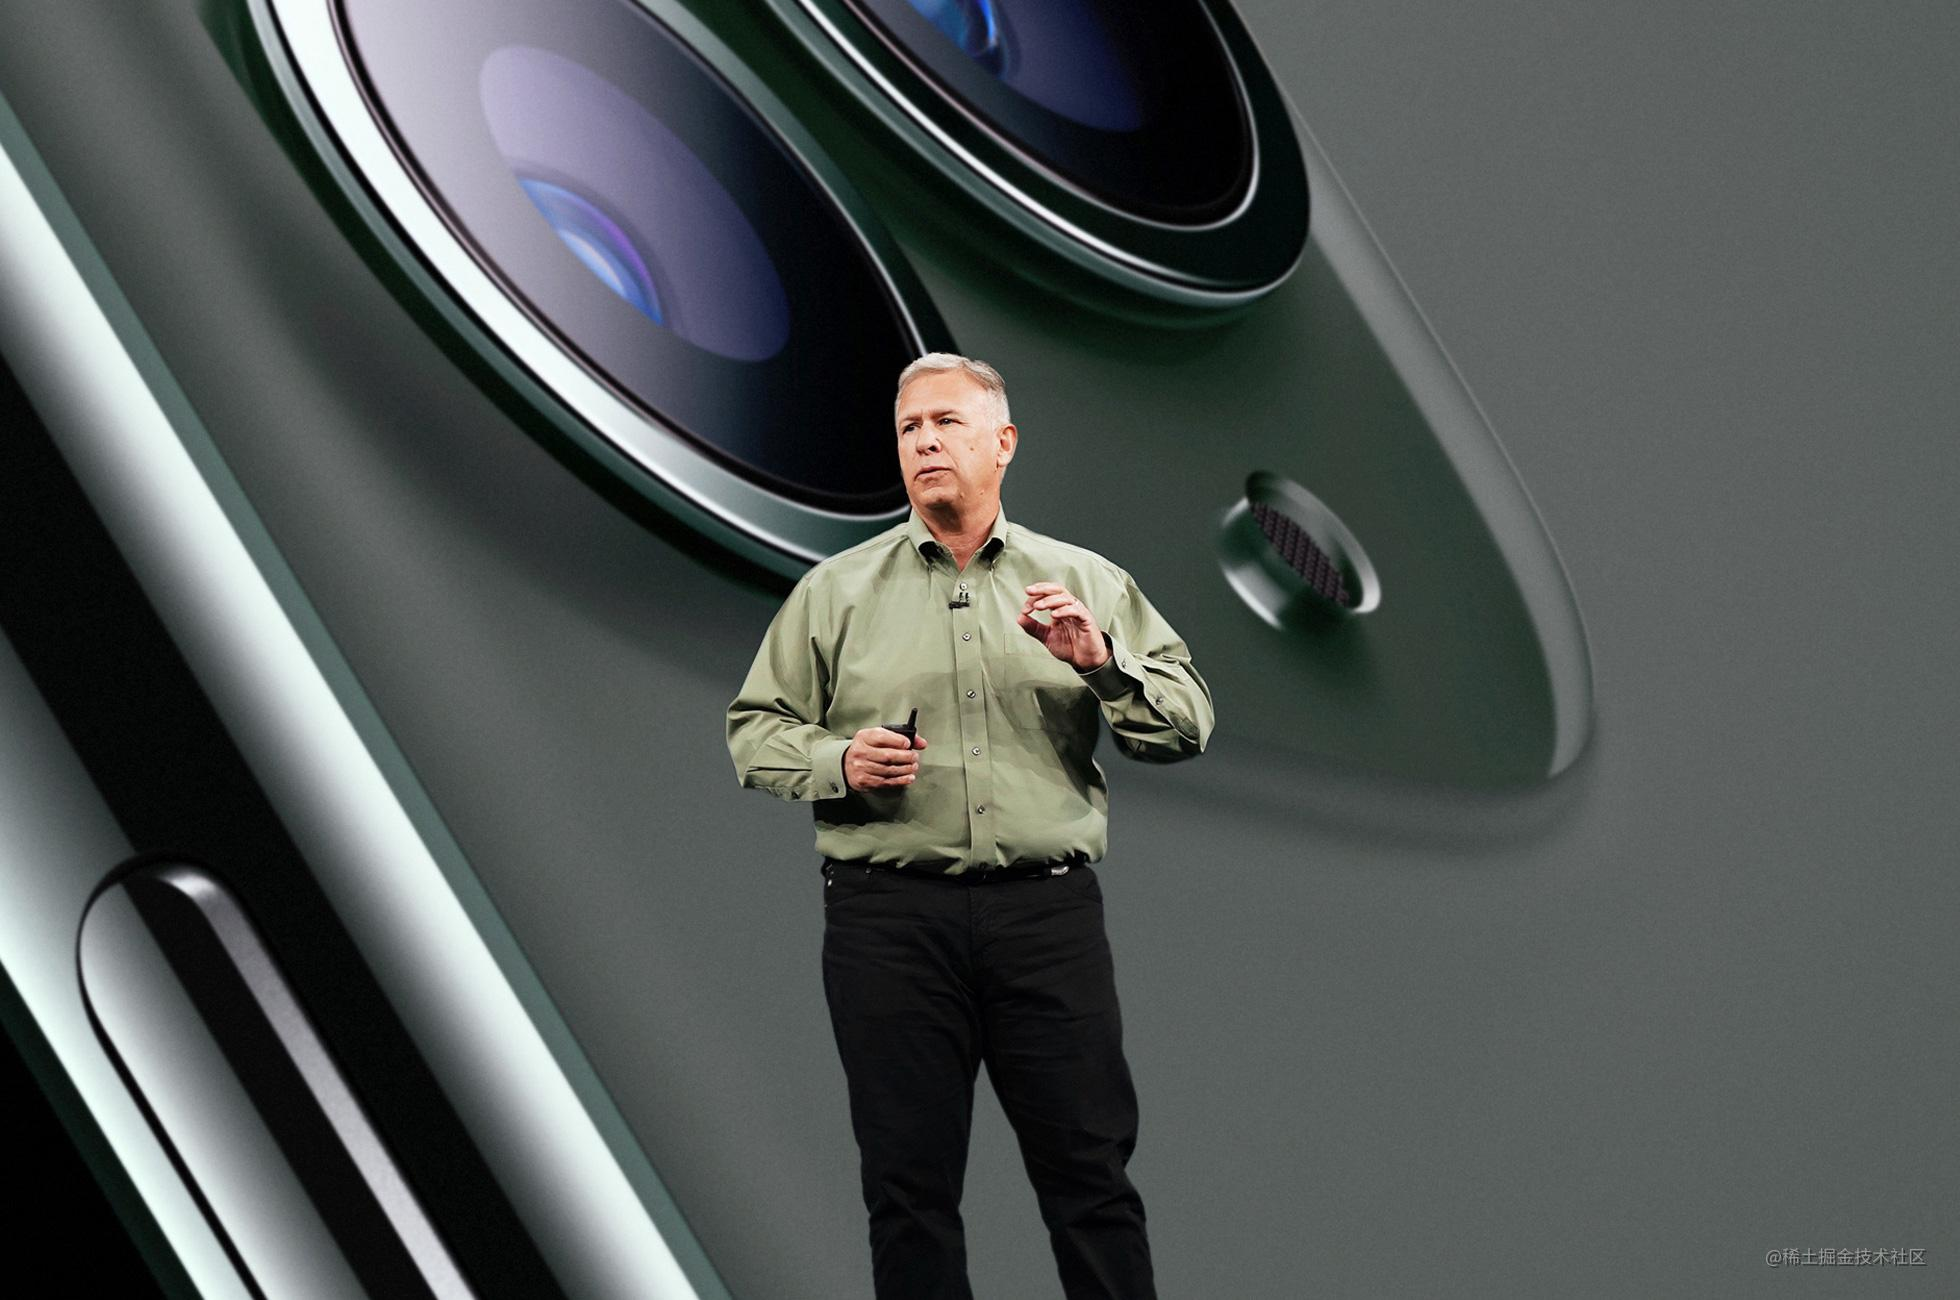 Phil-Schiller-advances-to-apple-fellow.jpg